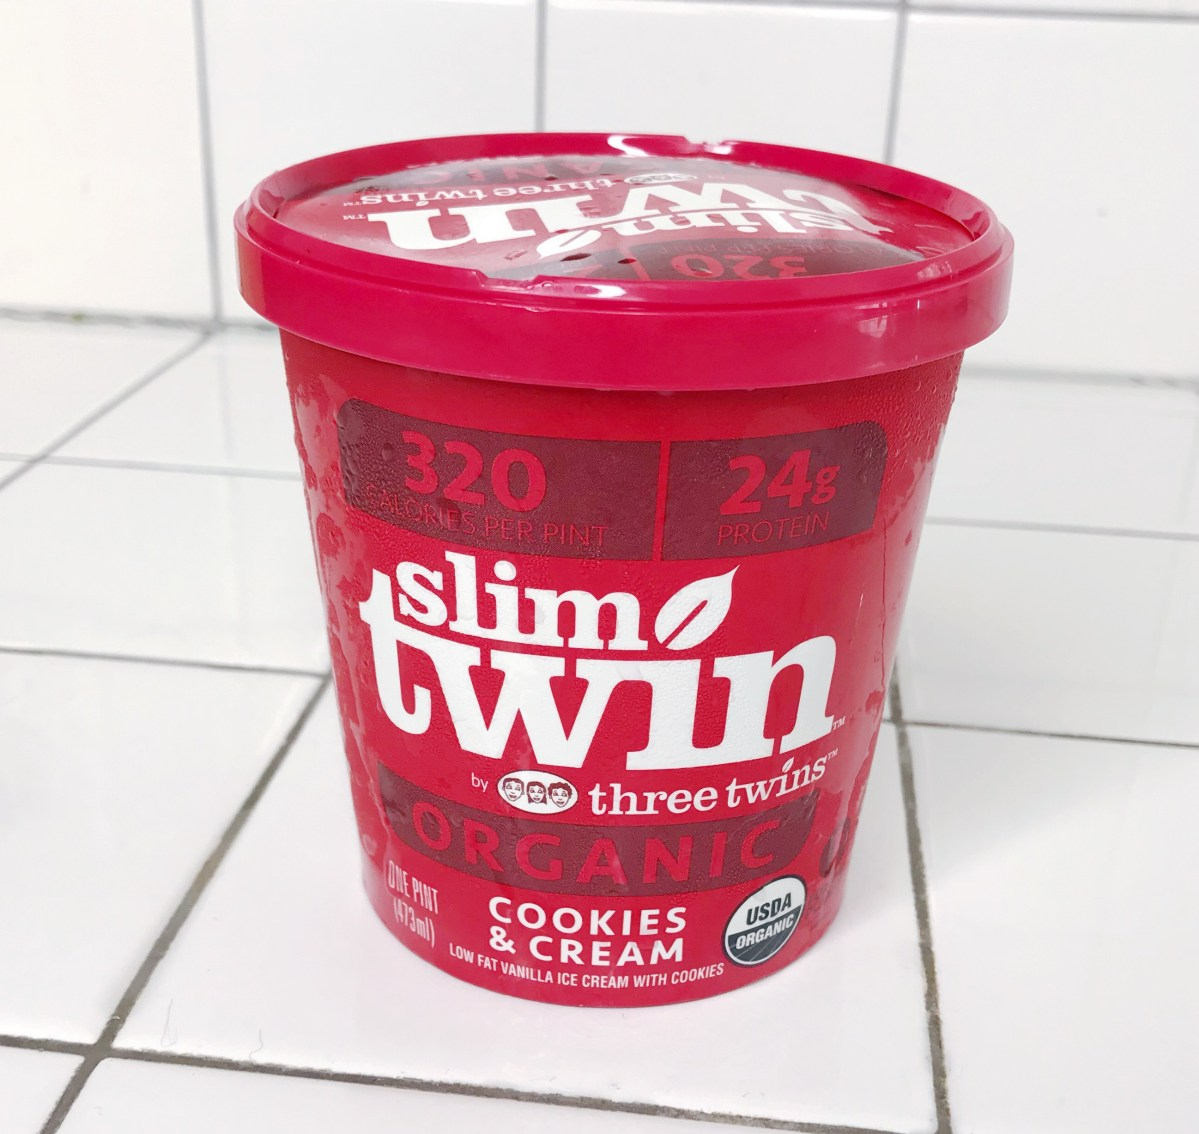 slim twin cookies and creme